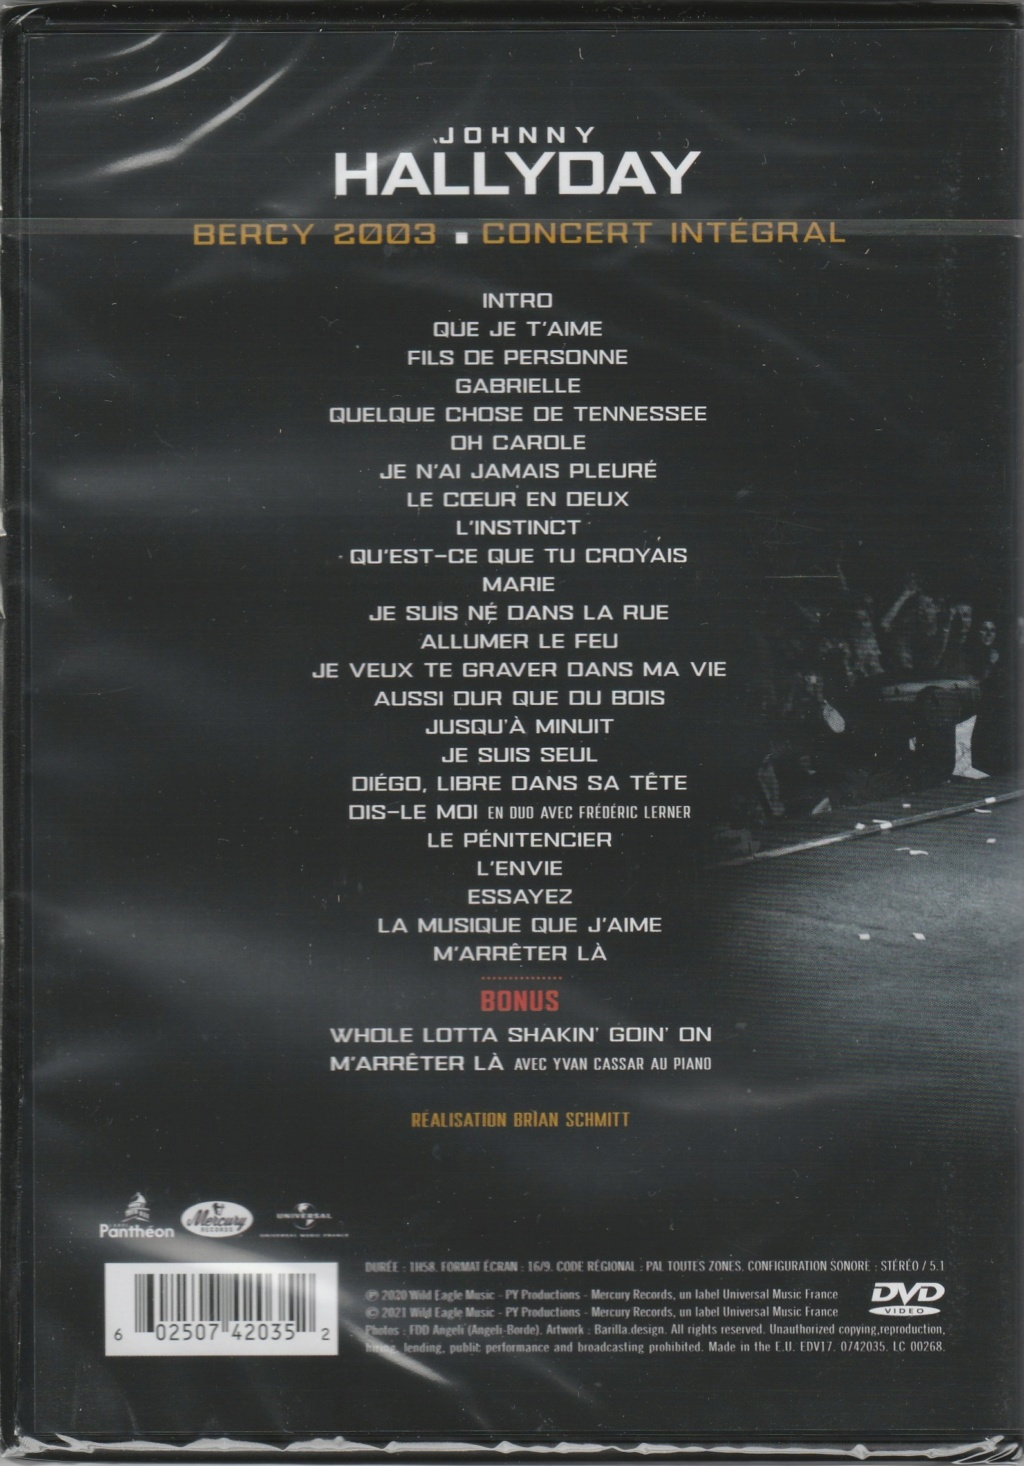 JAQUETTE DVD CONCERTS ( Jaquette + Sticker ) Img_2459